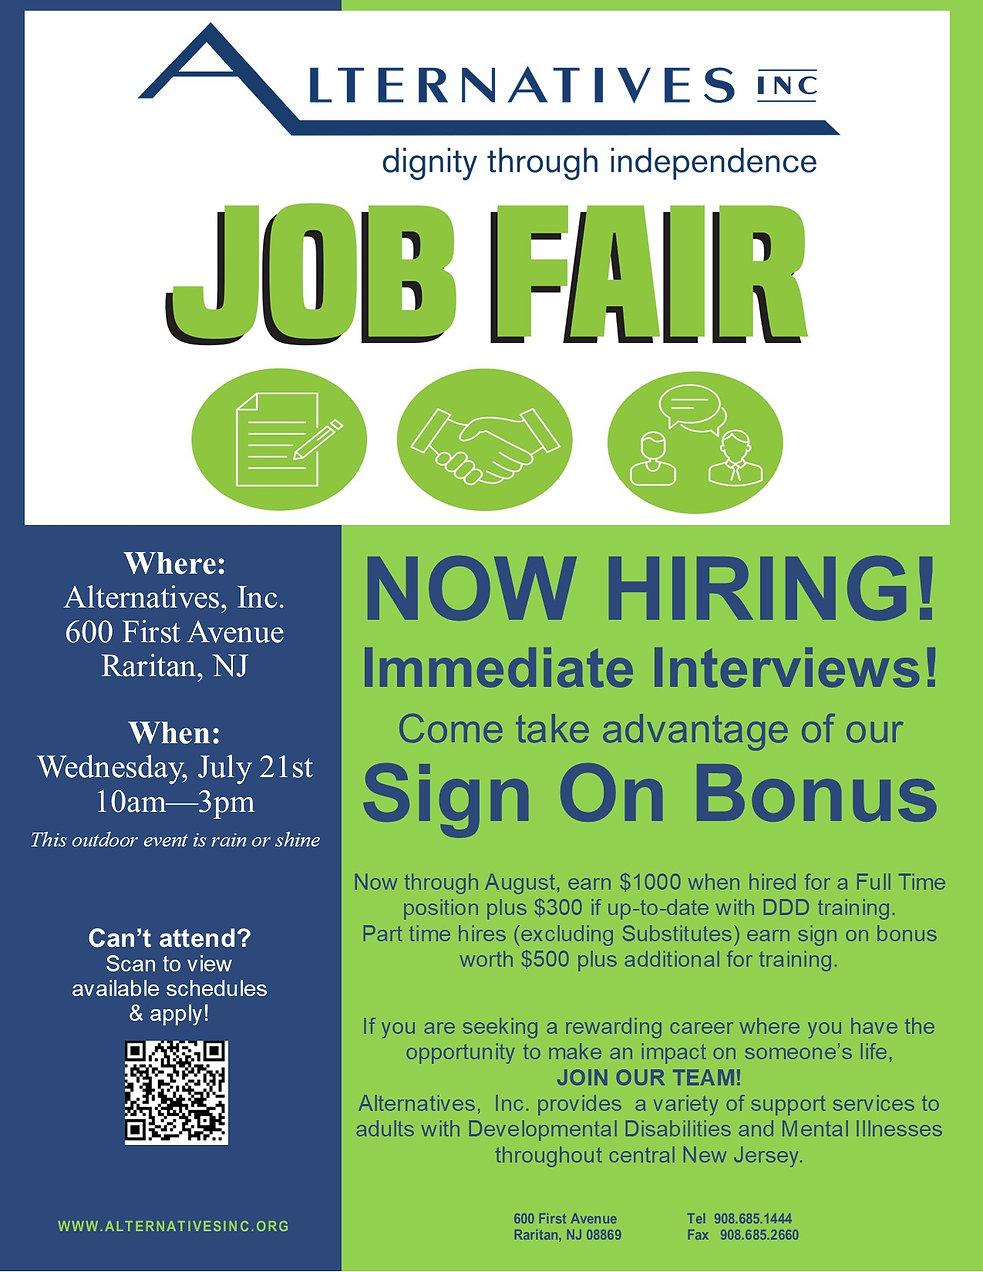 JOB FAIR Flyer SignOn Bonus.jpg